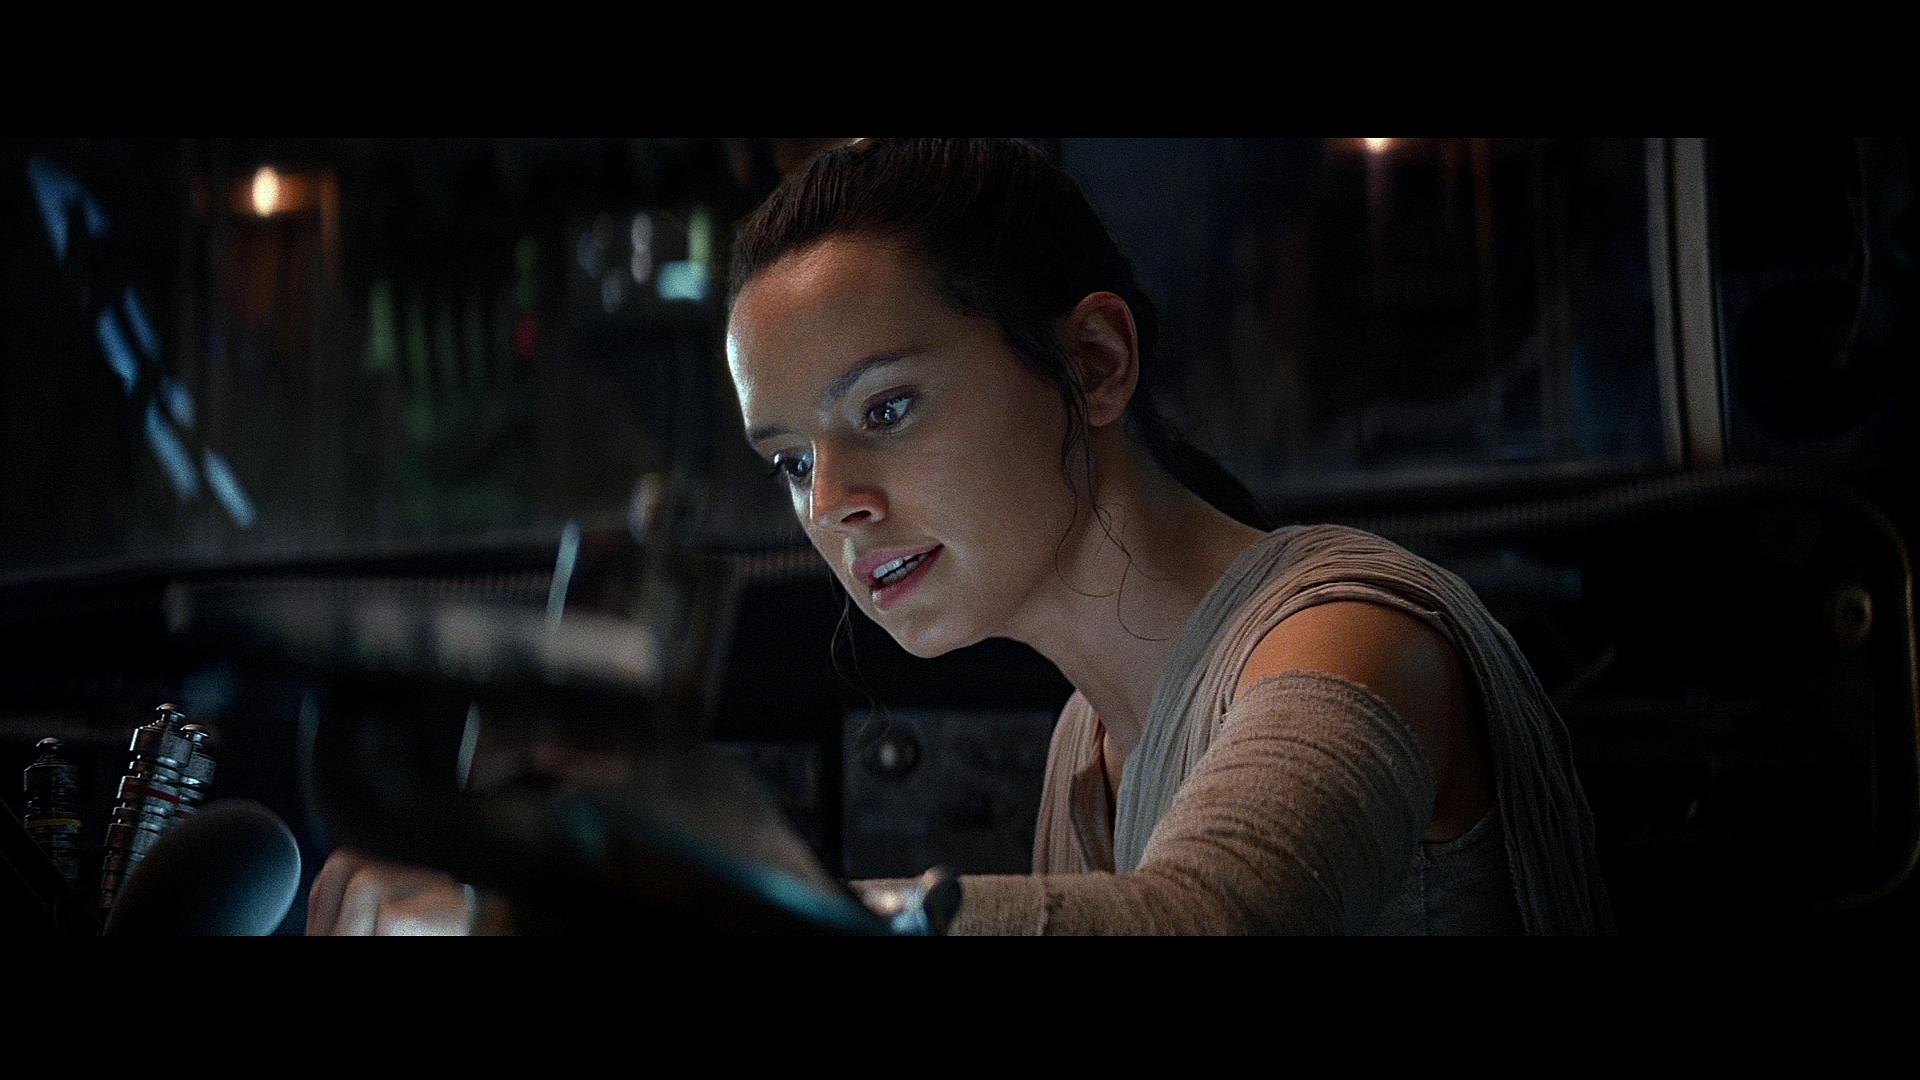 Best Wallpaper Movie Rey - Star-Wars-The-Force-Awakens-Star-Wars-Rey-from-Star-Wars-Daisy-Ridley-1149584  Picture_204835.jpg